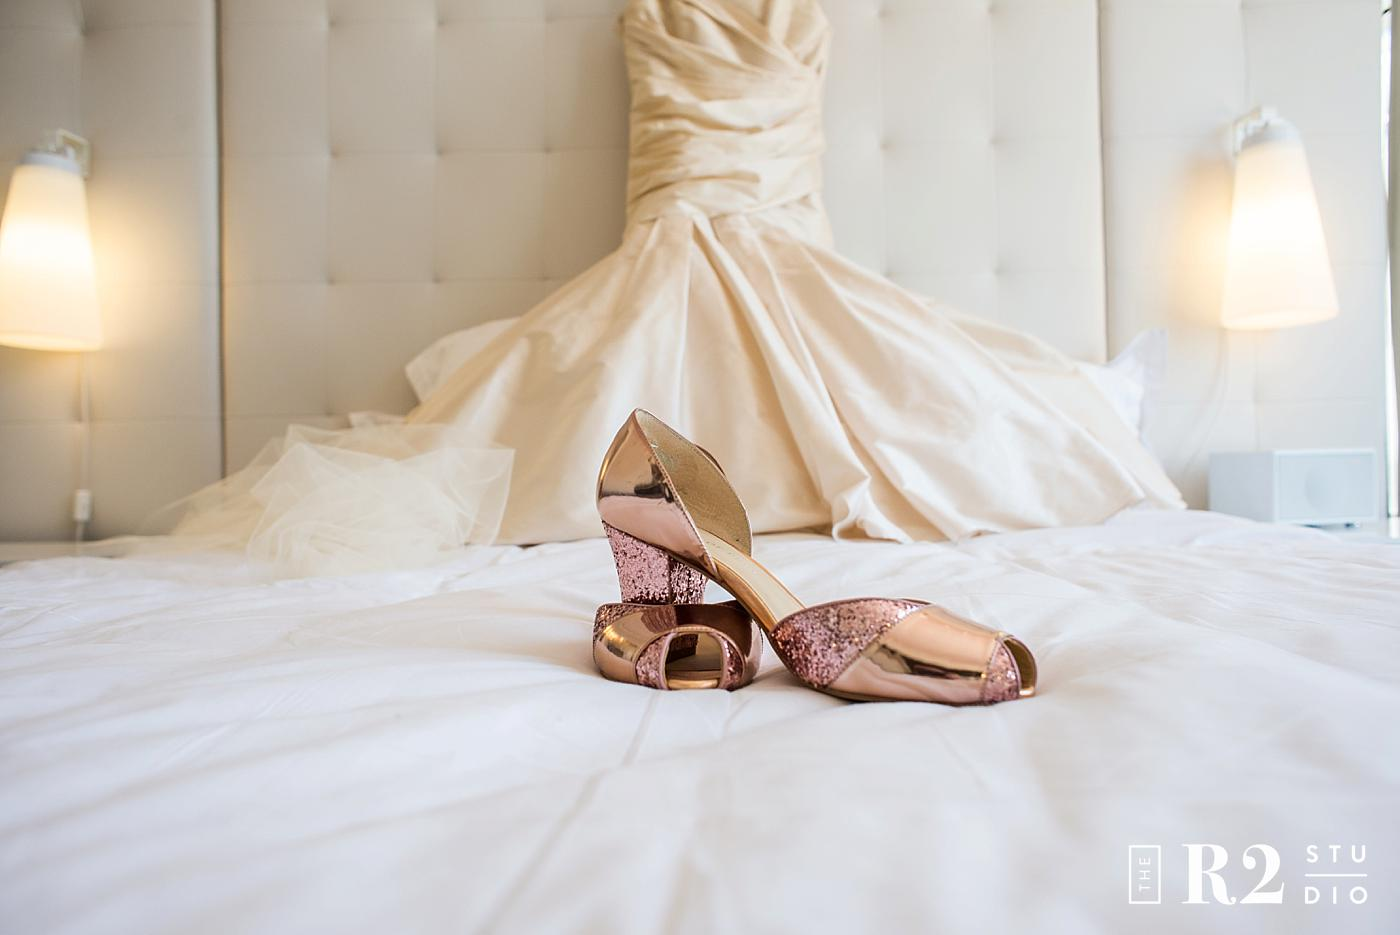 #slslasvegaswedding #slslasvegas #rosegoldweddingshoes #glitterweddingshoes #weddingdress #dress #slsweddingsuite #slsweddinglasvegas #desirableeventsbydesi, #weddingplannerlasvegas,#lasvegasweddingcoordinators,#weddingcoordinatorslasvegas,#weddingcoordinatorlasvegas,#lasvegasweddingplanner #desirableeventsbydesi #Tropicanawedding #wedding, #love, #lovewins, #samesexwedding, #gaywedding, #tropicana, #lasvegaswedding, #weddinglasvegas, #weddingplannerslasvegas, #lasvegasweddingplanners, # layersoflovely, #lasvegaswedding, #susieandwill, #rusticwedding, #wedding, #historic5thstreetschool, #downtownlasvegas, #sls, #sayersclub, #bazaarmeats, #slslv, #slslasvegas #slsweddings, #lasvegasweddings,